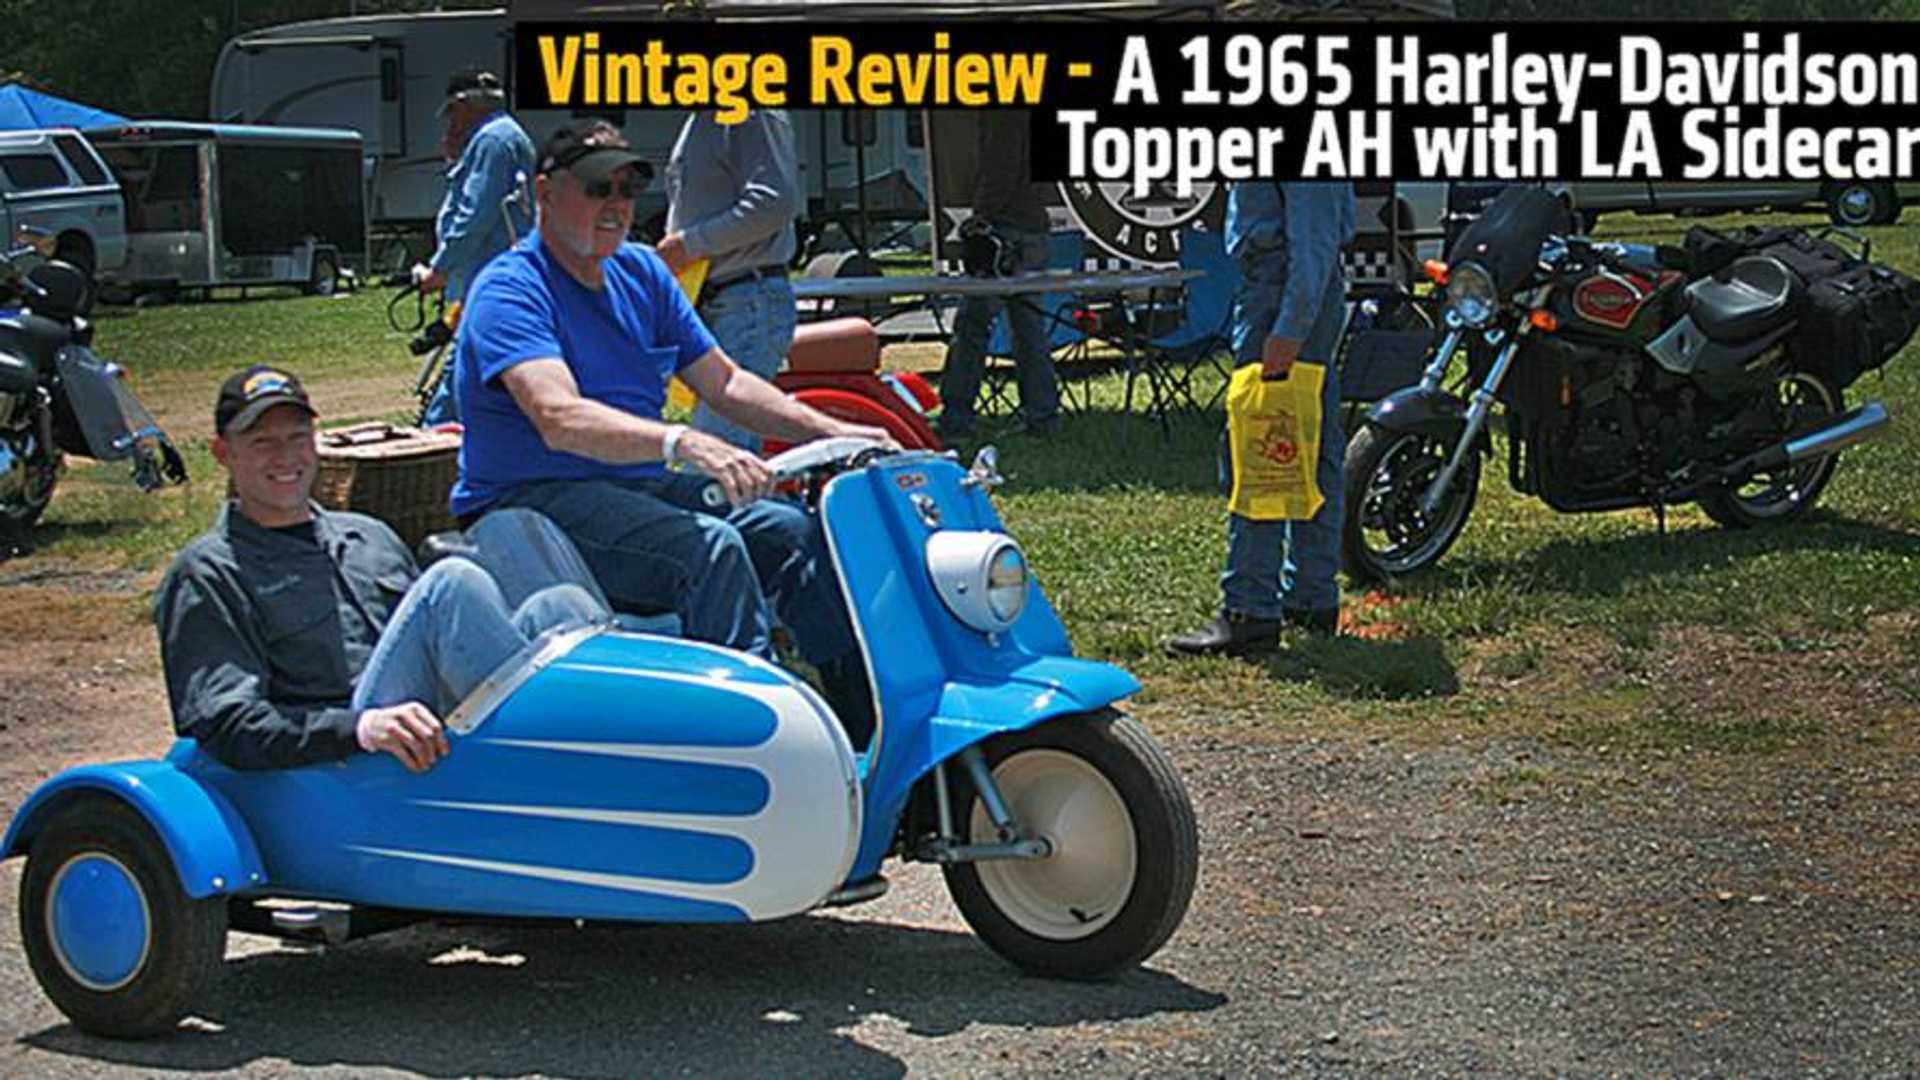 Vintage Review - A 1965 Harley-Davidson Topper AH with LA